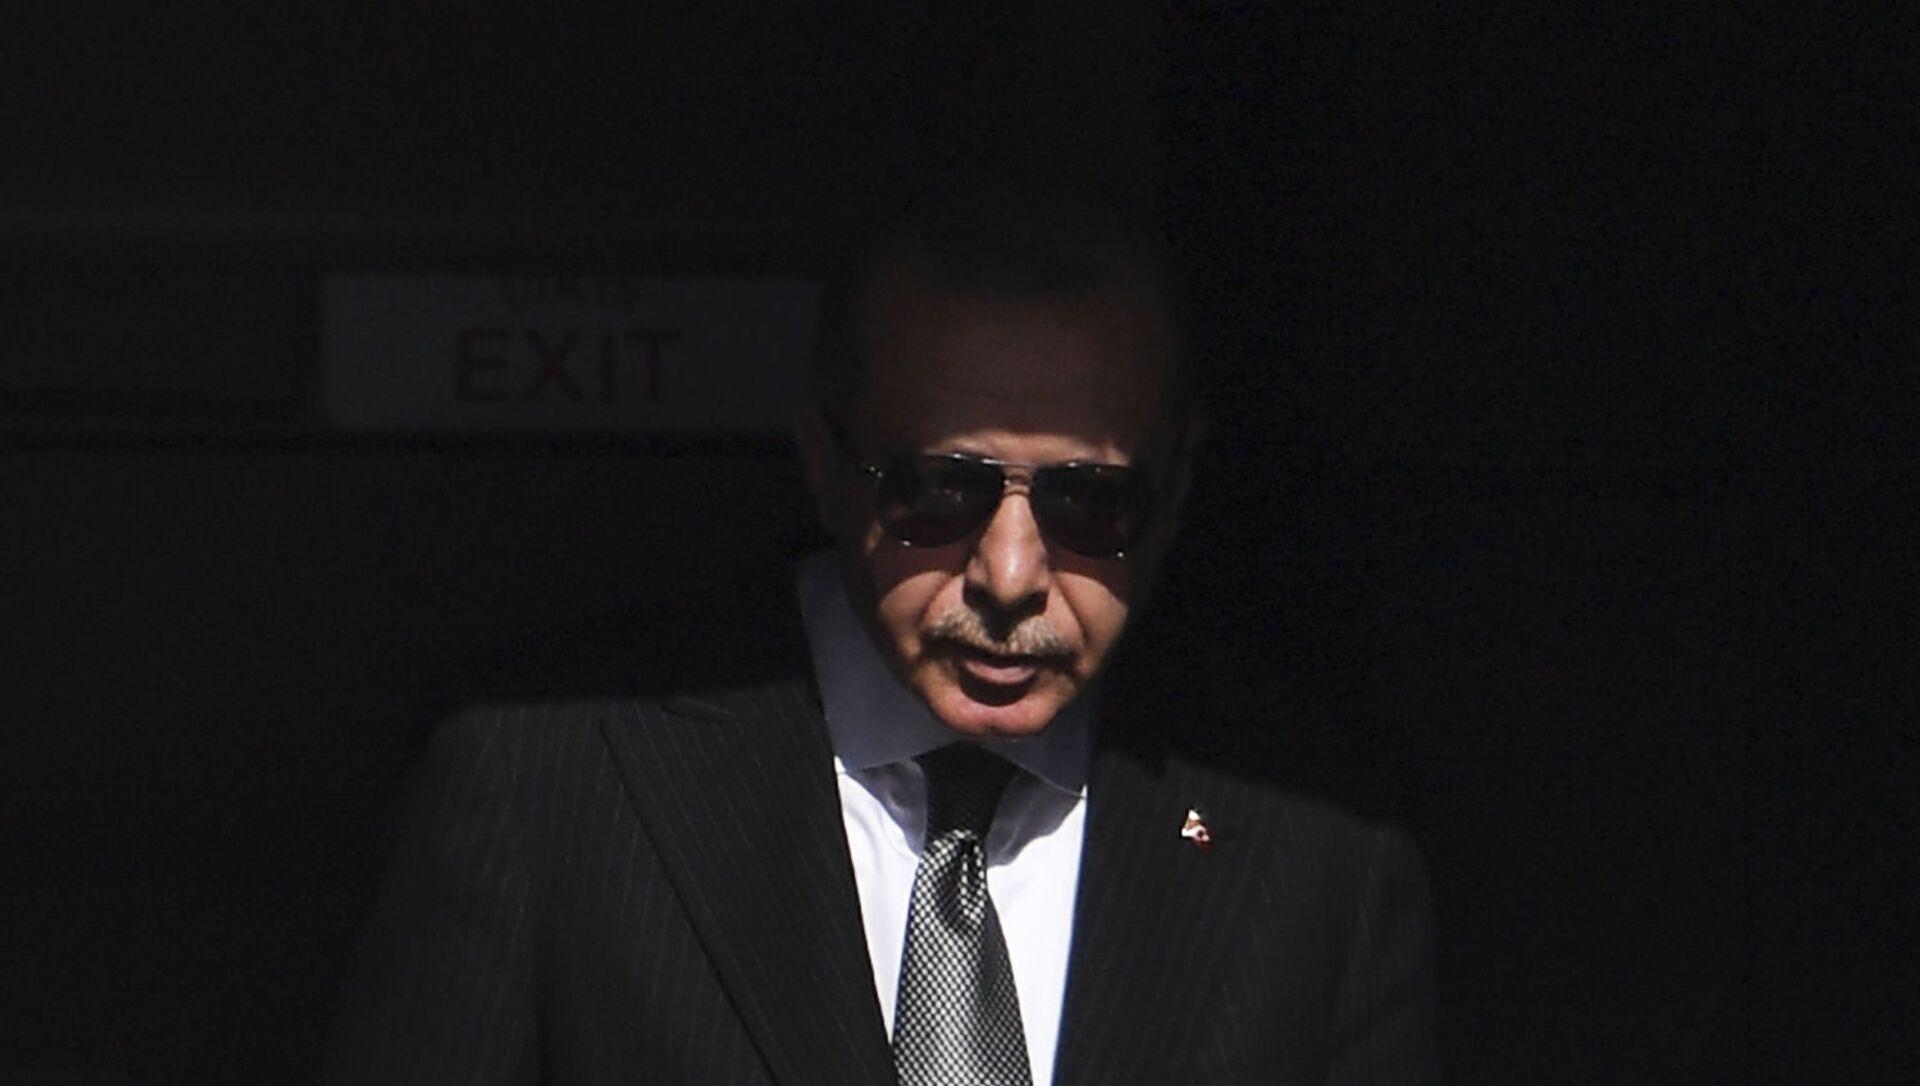 Президент Турции Реджеп Тайип Эрдоган, фото из архива - Sputnik Азербайджан, 1920, 16.06.2021